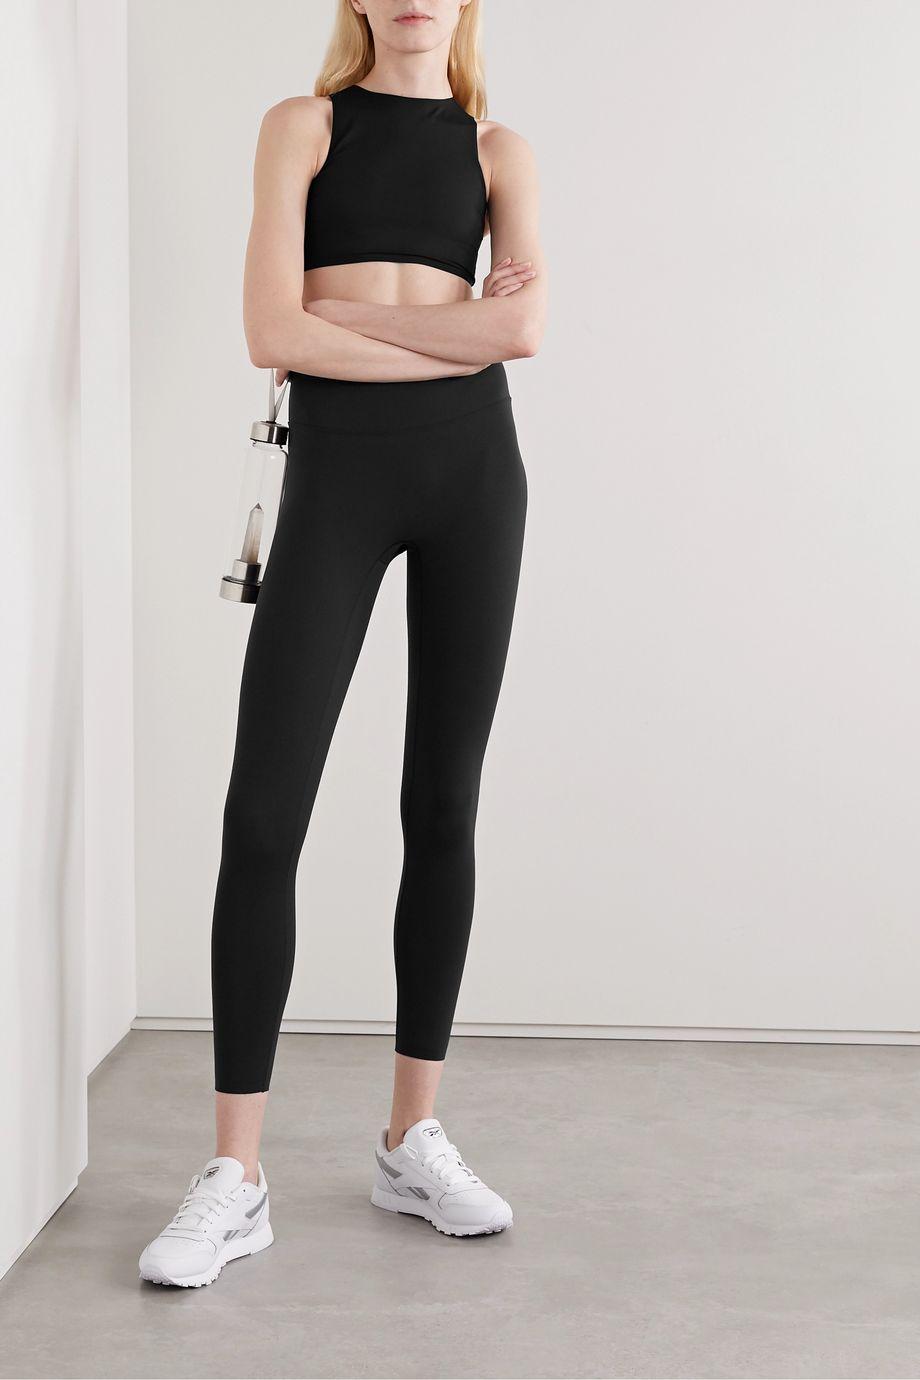 Reebok X Victoria Beckham Printed stretch leggings